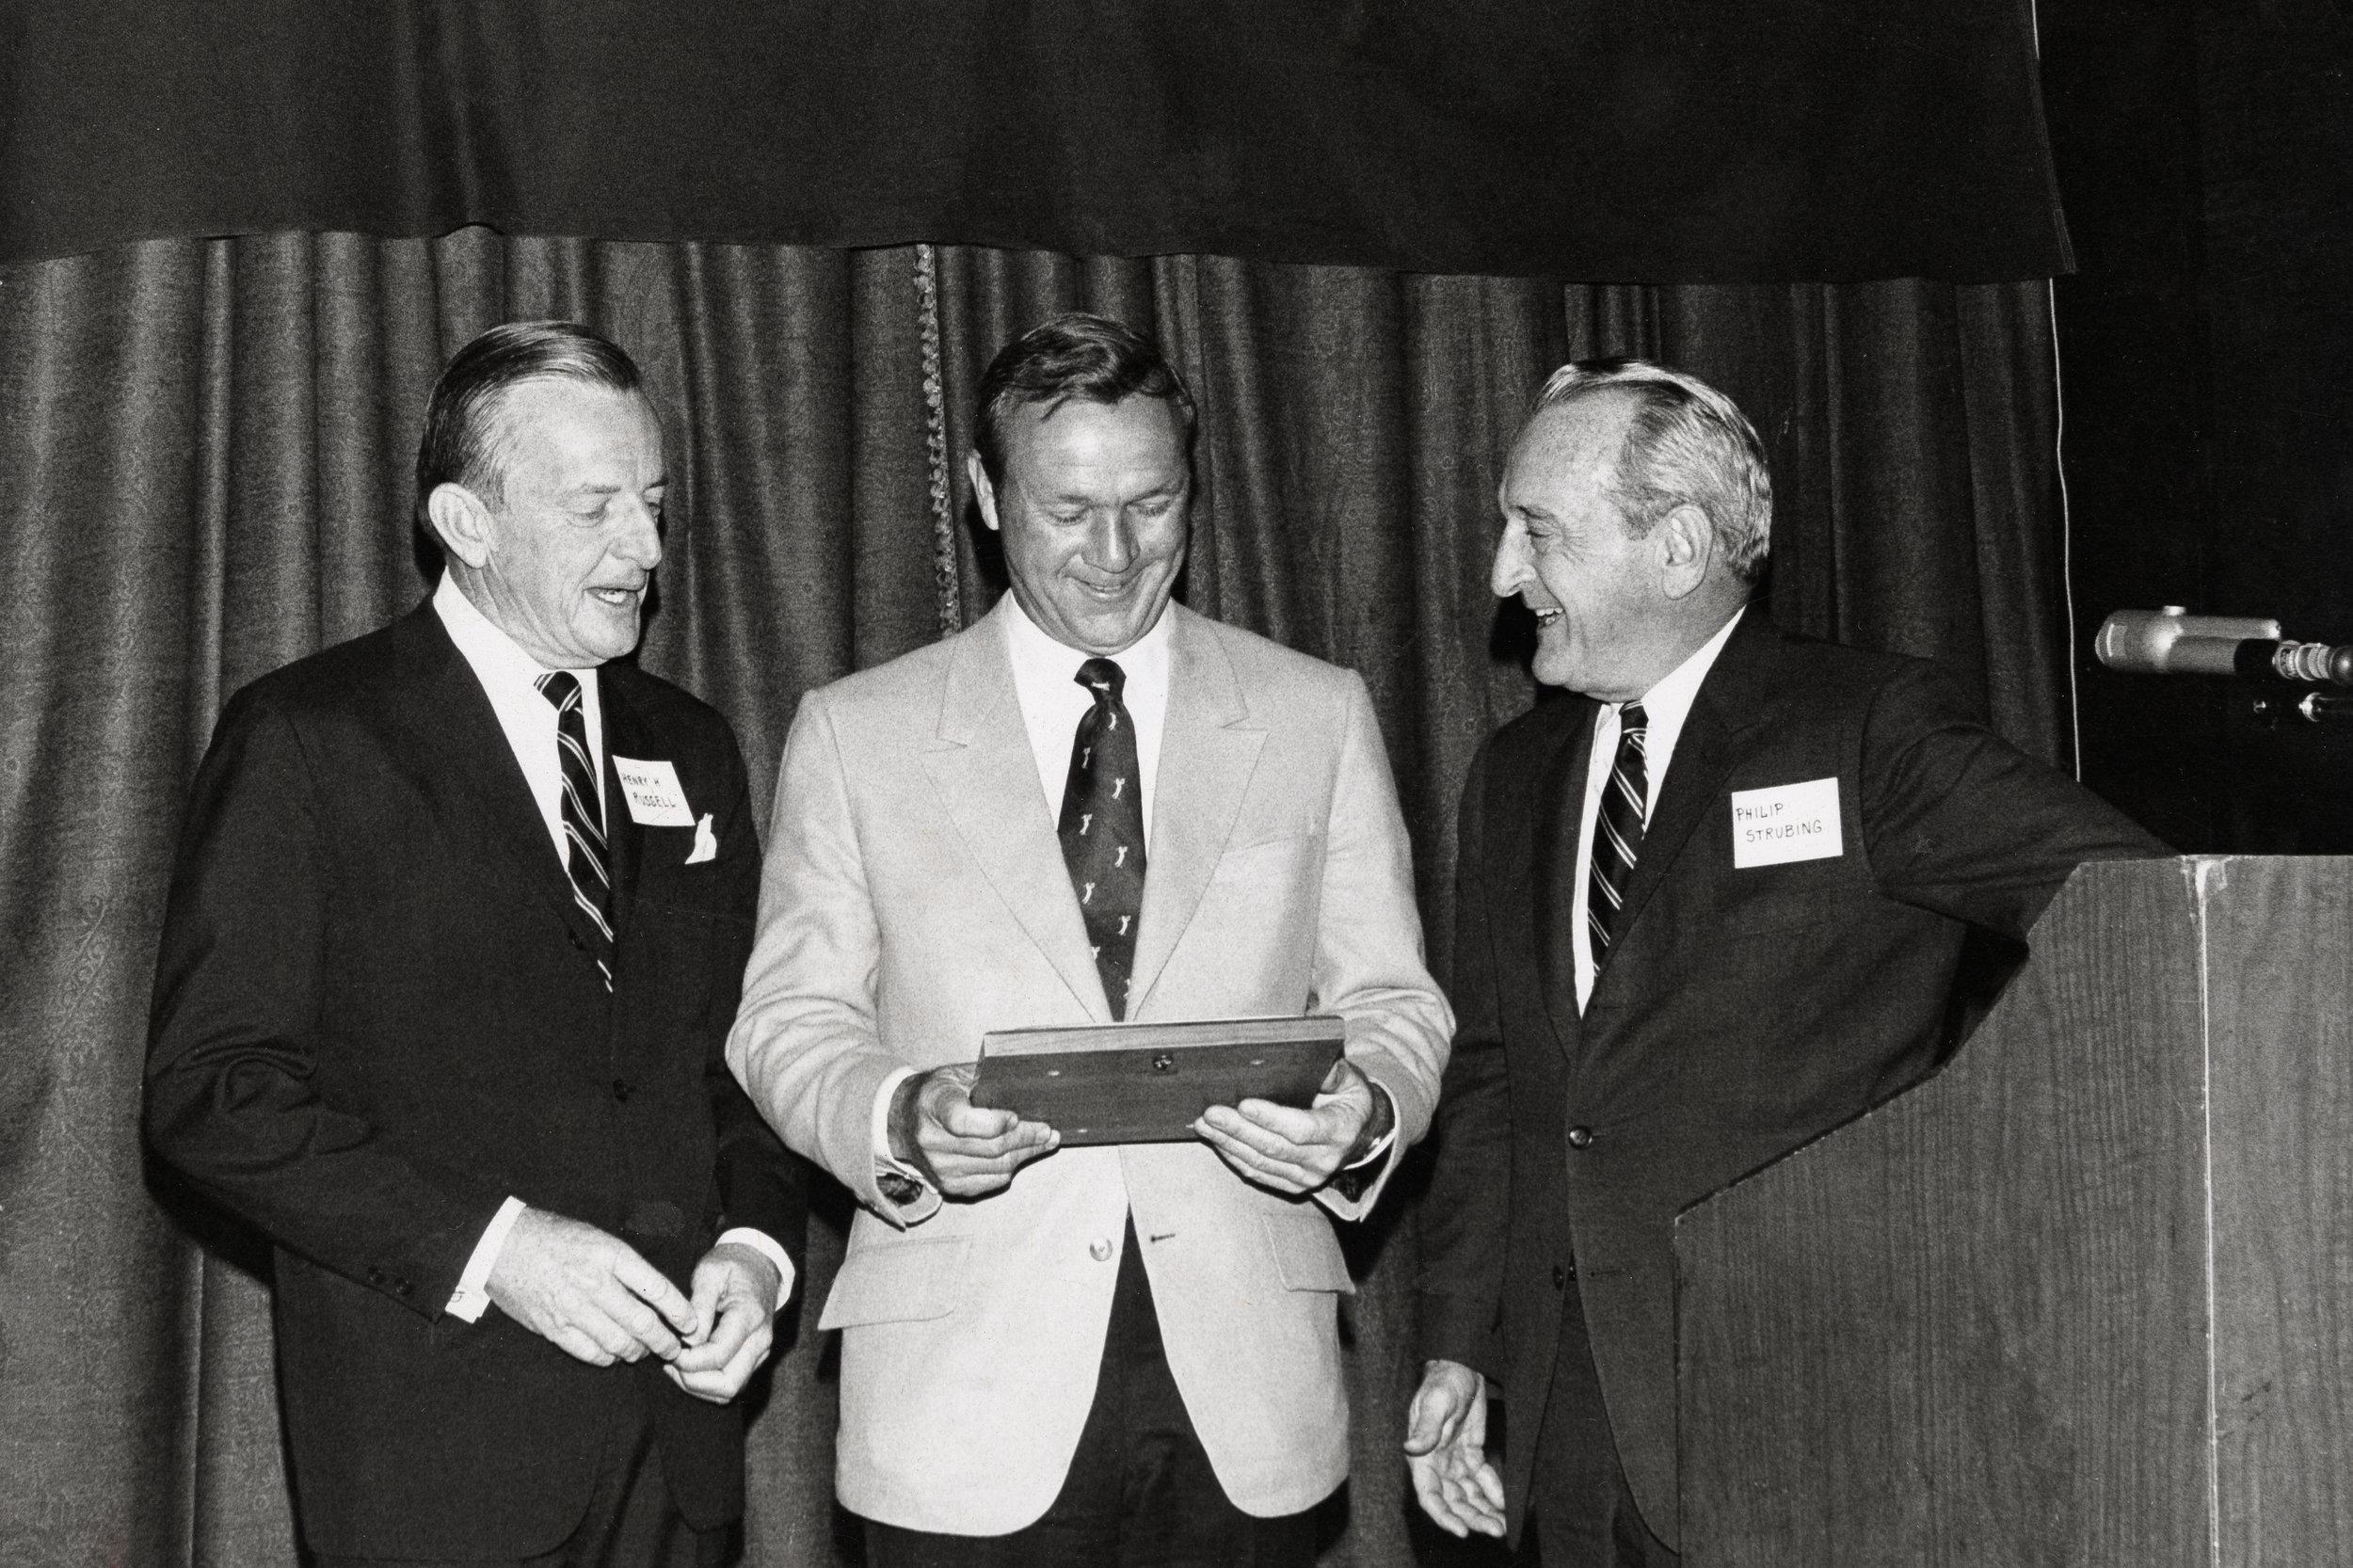 Arnold Palmer receiving the Bob Jones Award from the USGA.